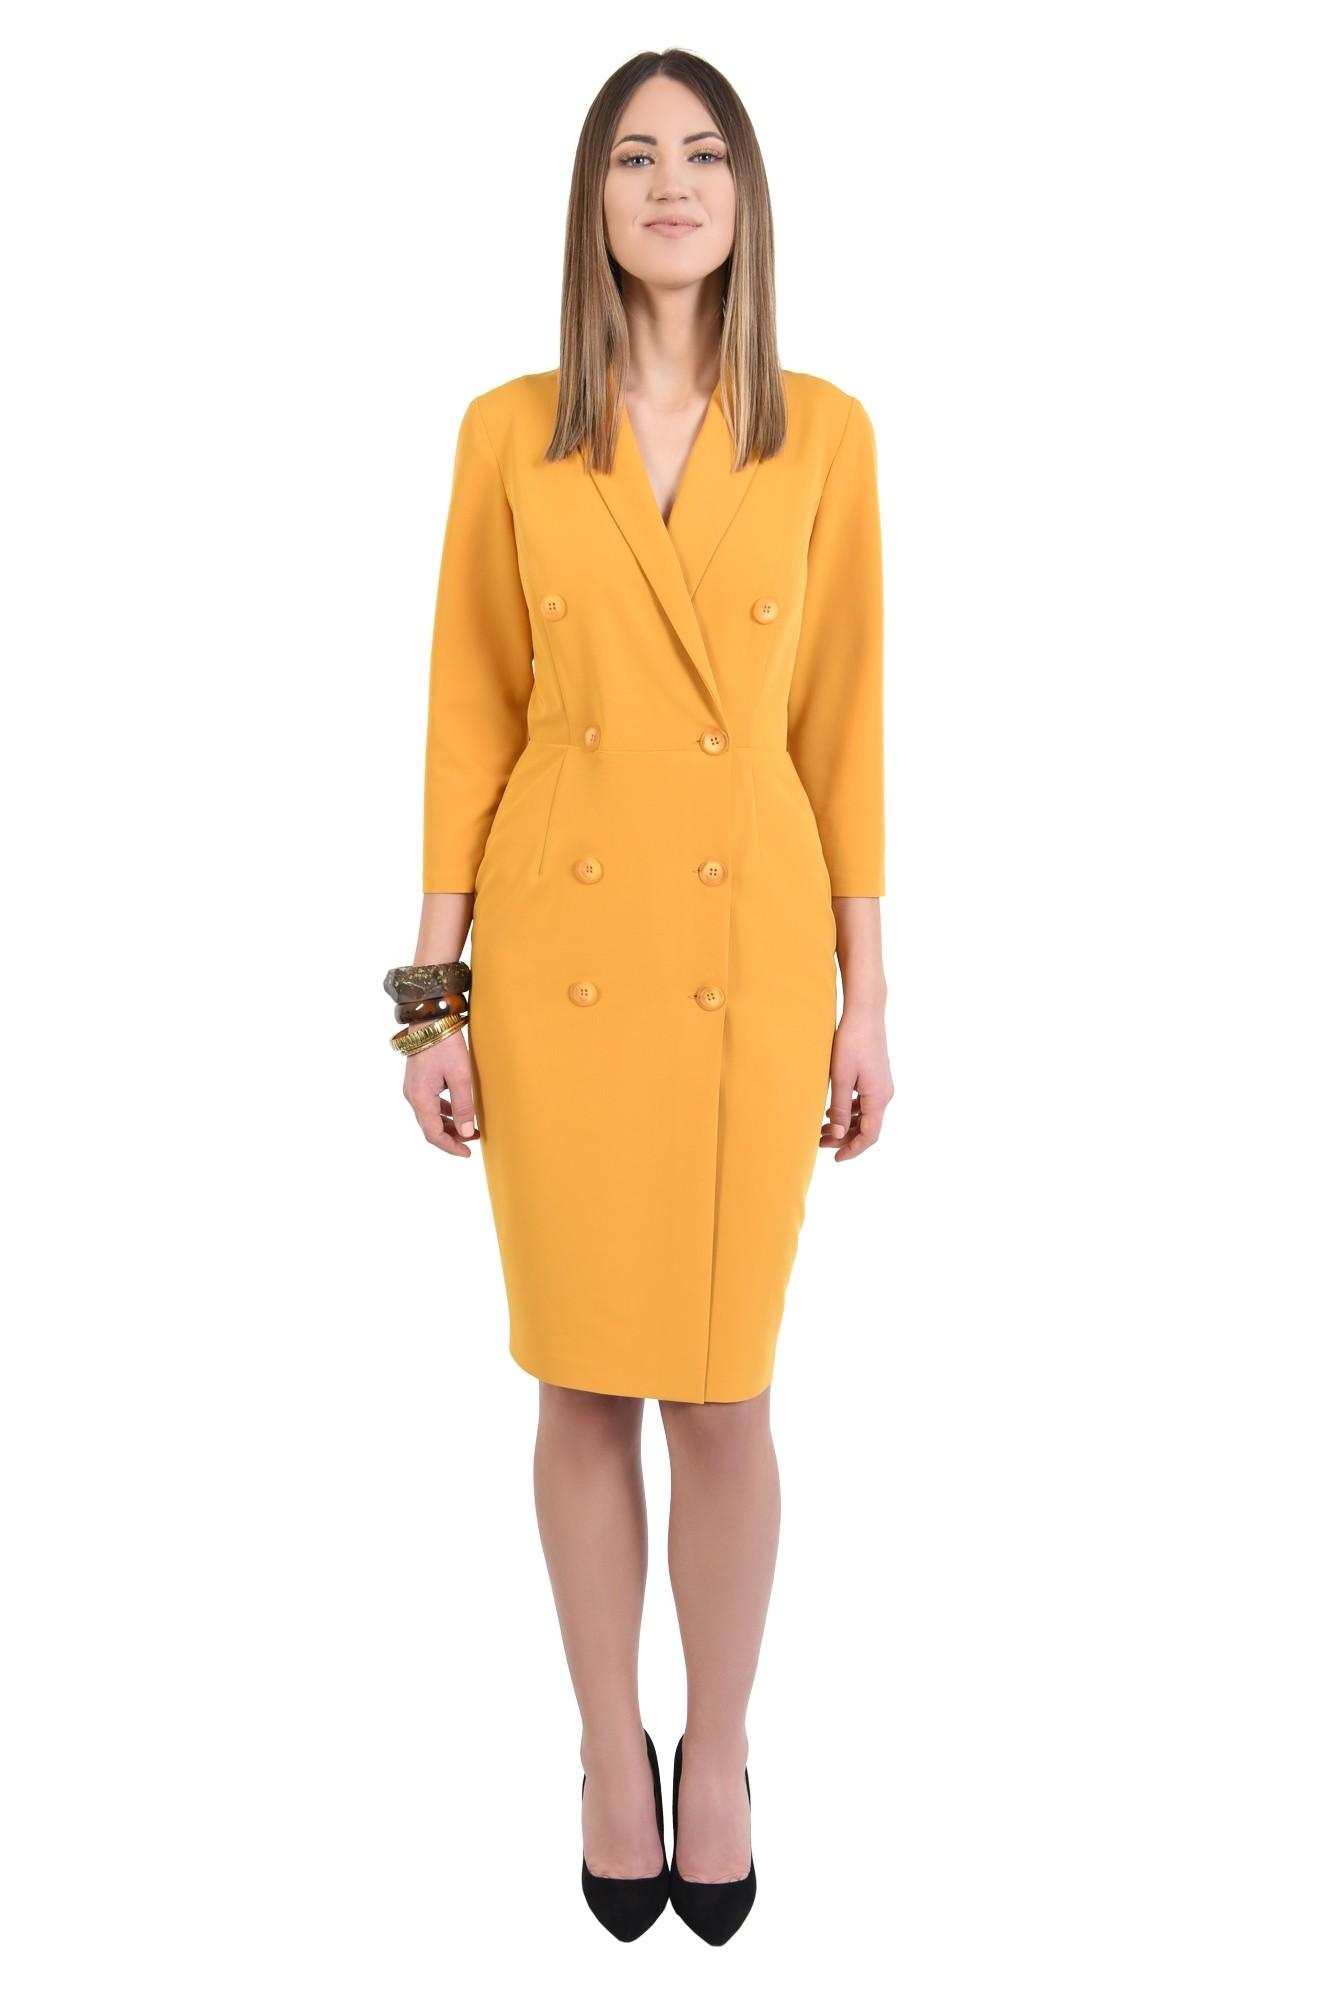 3 - 360 - rochie eleganta, conica, midi, galbena, mustar, rochie office